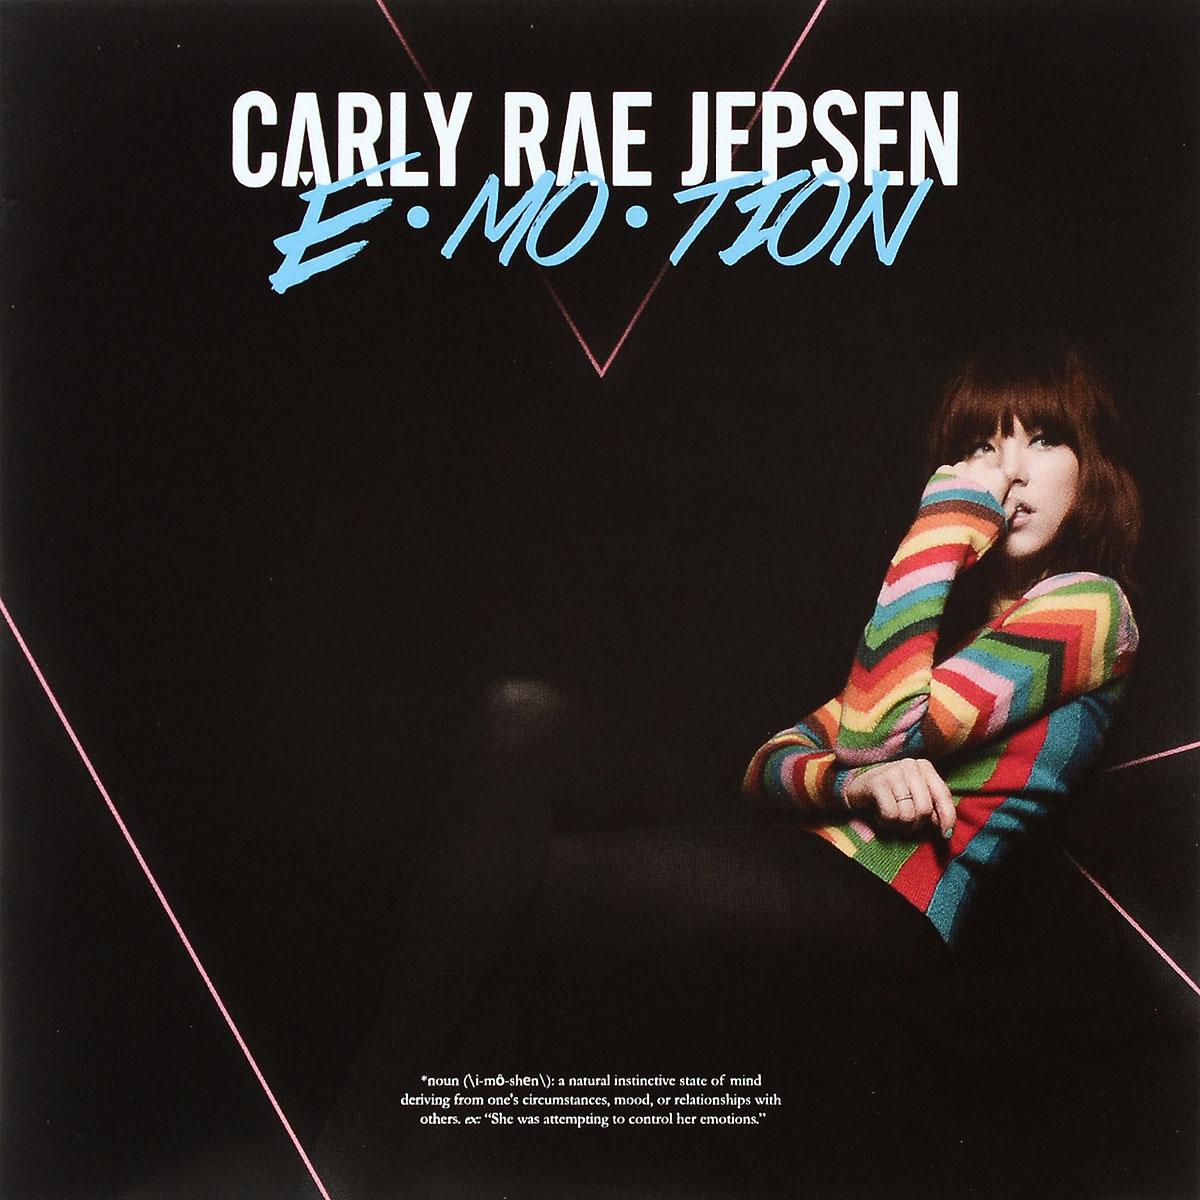 Carly Rae Jepsen. E-Mo-Tion